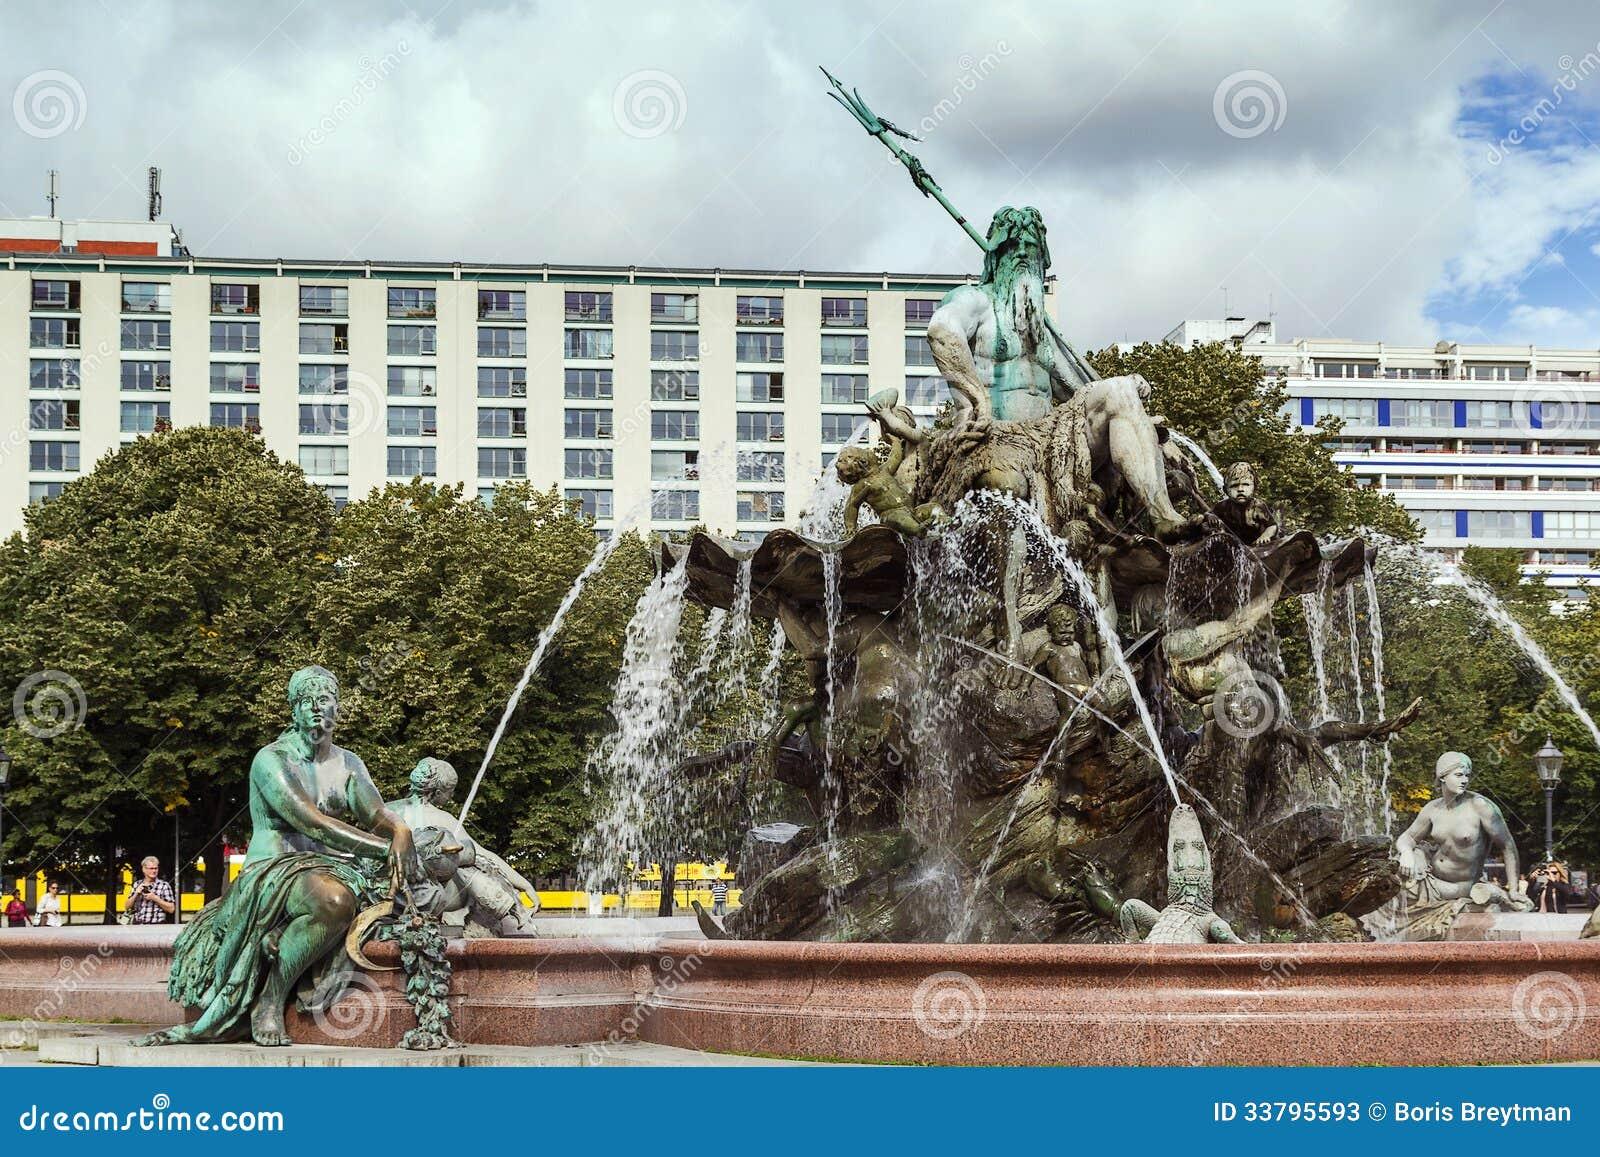 Superb Der Neptun Brunnen In Berlin, Deutschland. Auslegung, Abbildung.